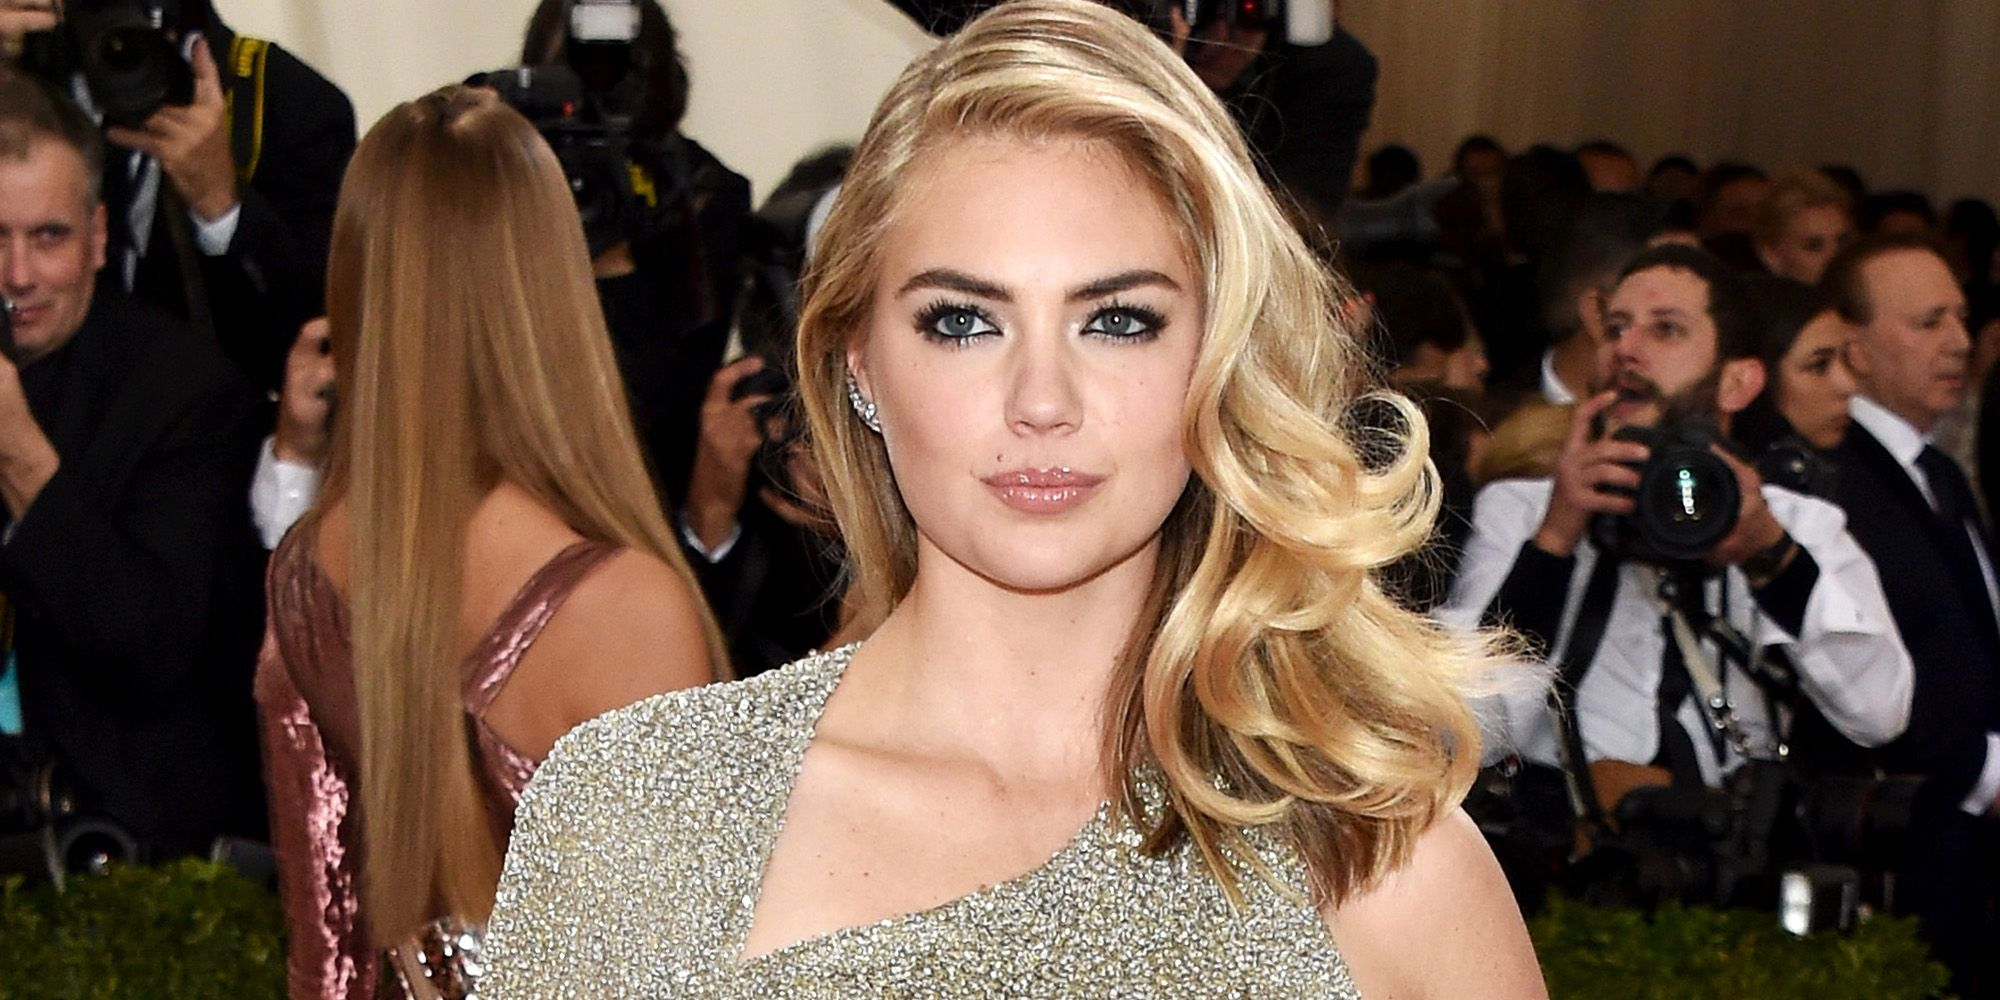 Kate Upton Signs To Next Models Kate Upton Returns To Modeling